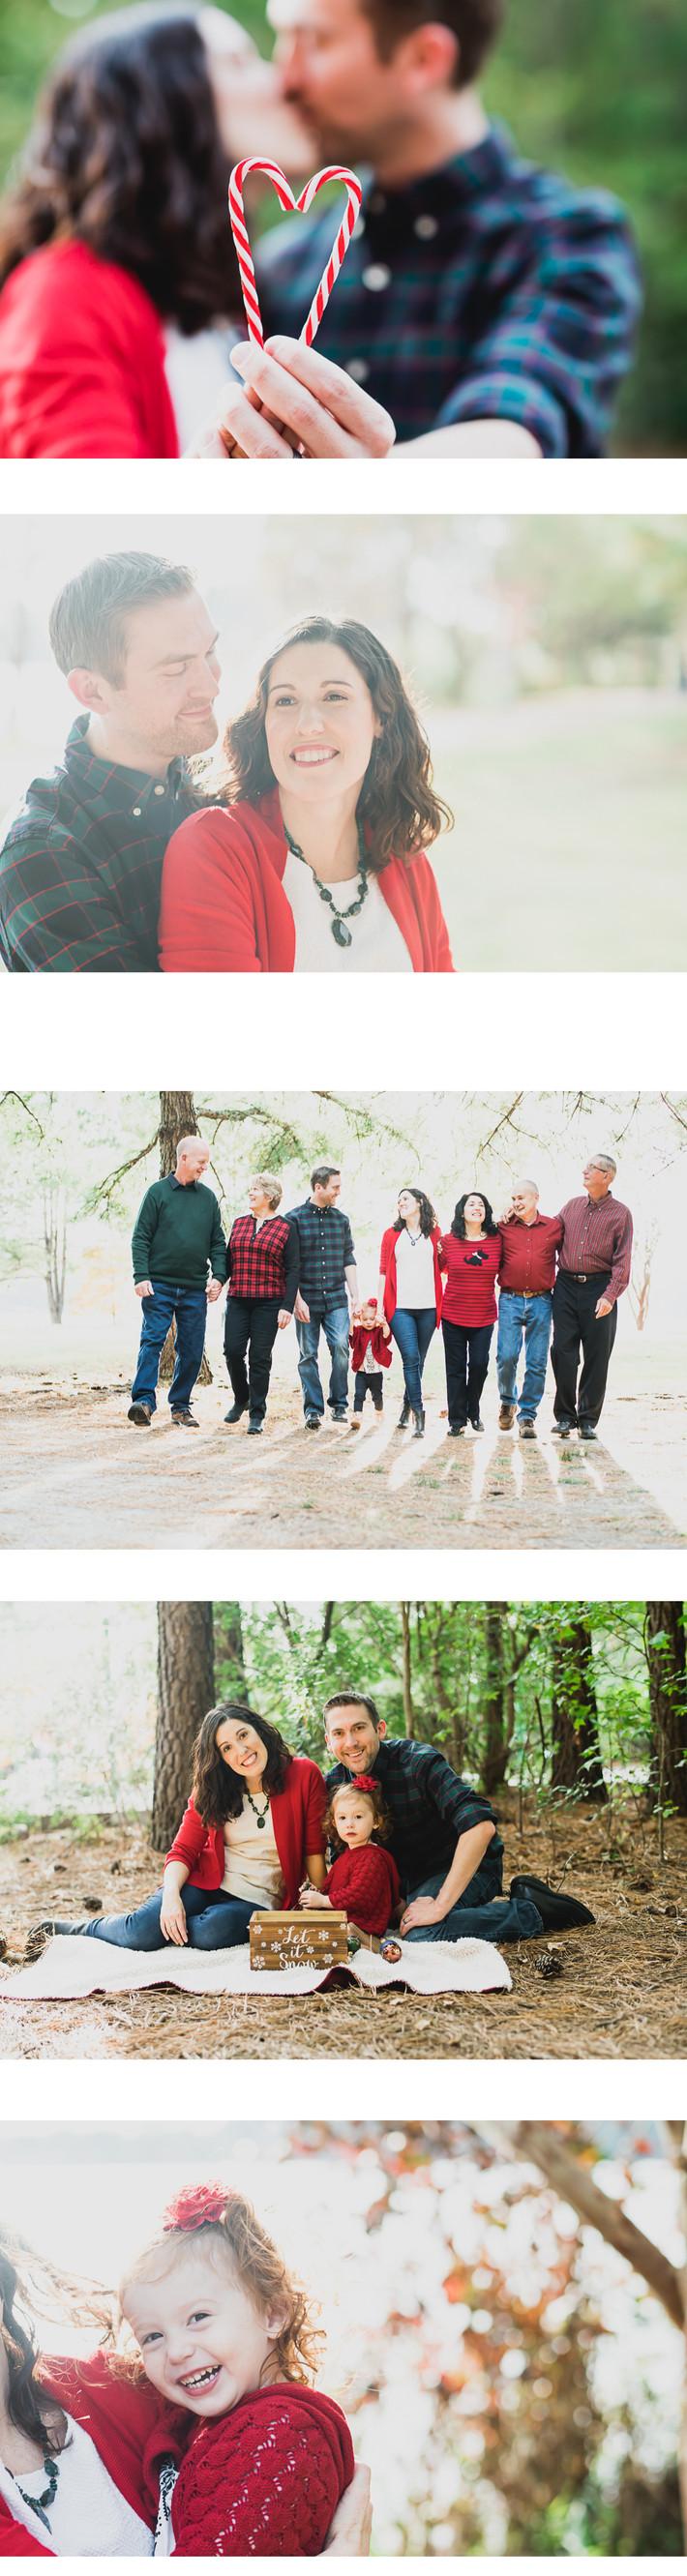 Chesapeake Virginia Oak Grove Lake Christmas Family Outdoor Toddler Photo Session